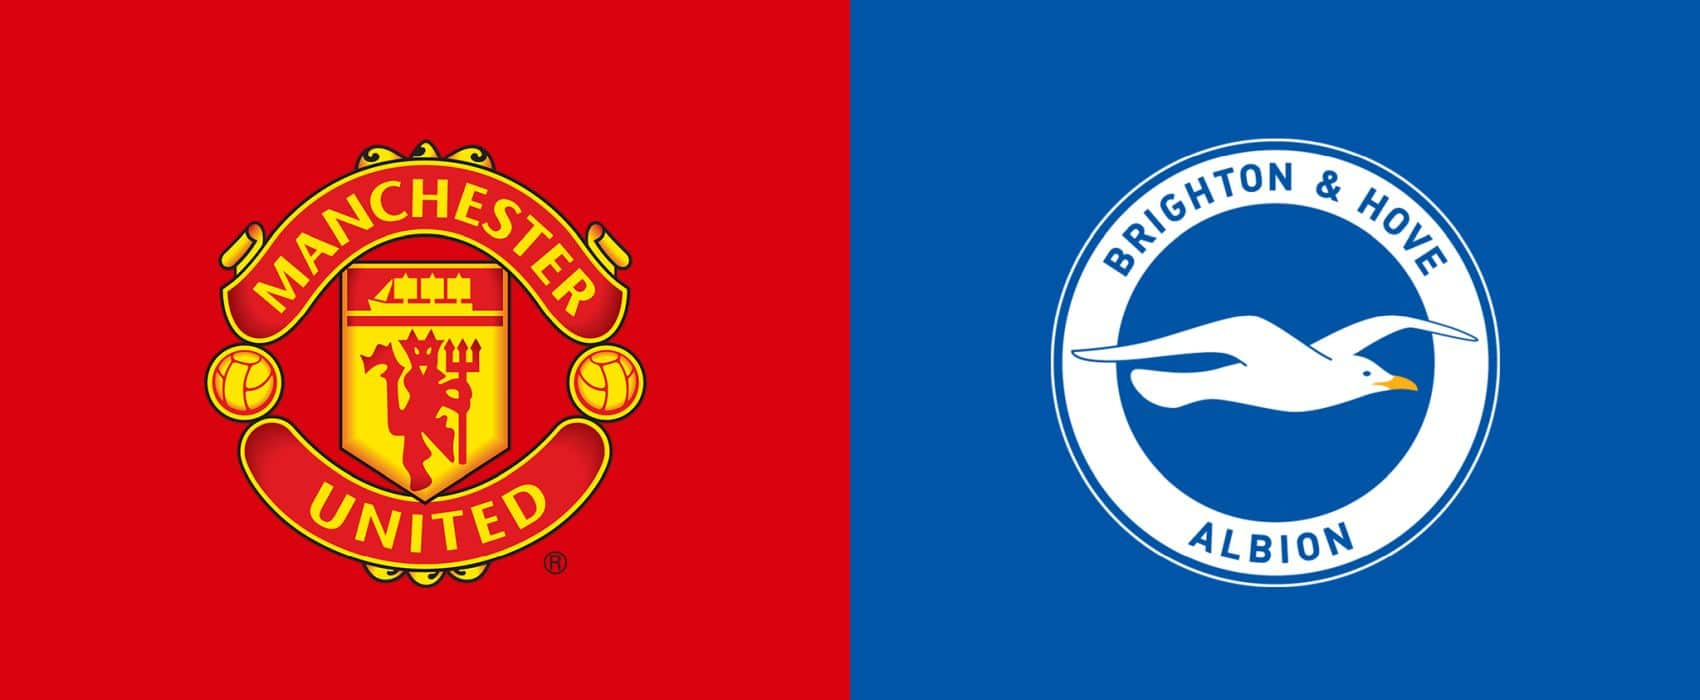 Zapowiedź: Manchester United - Brighton & Hove Albion   ManUtd.pl - Serwis kibiców klubu Manchester United